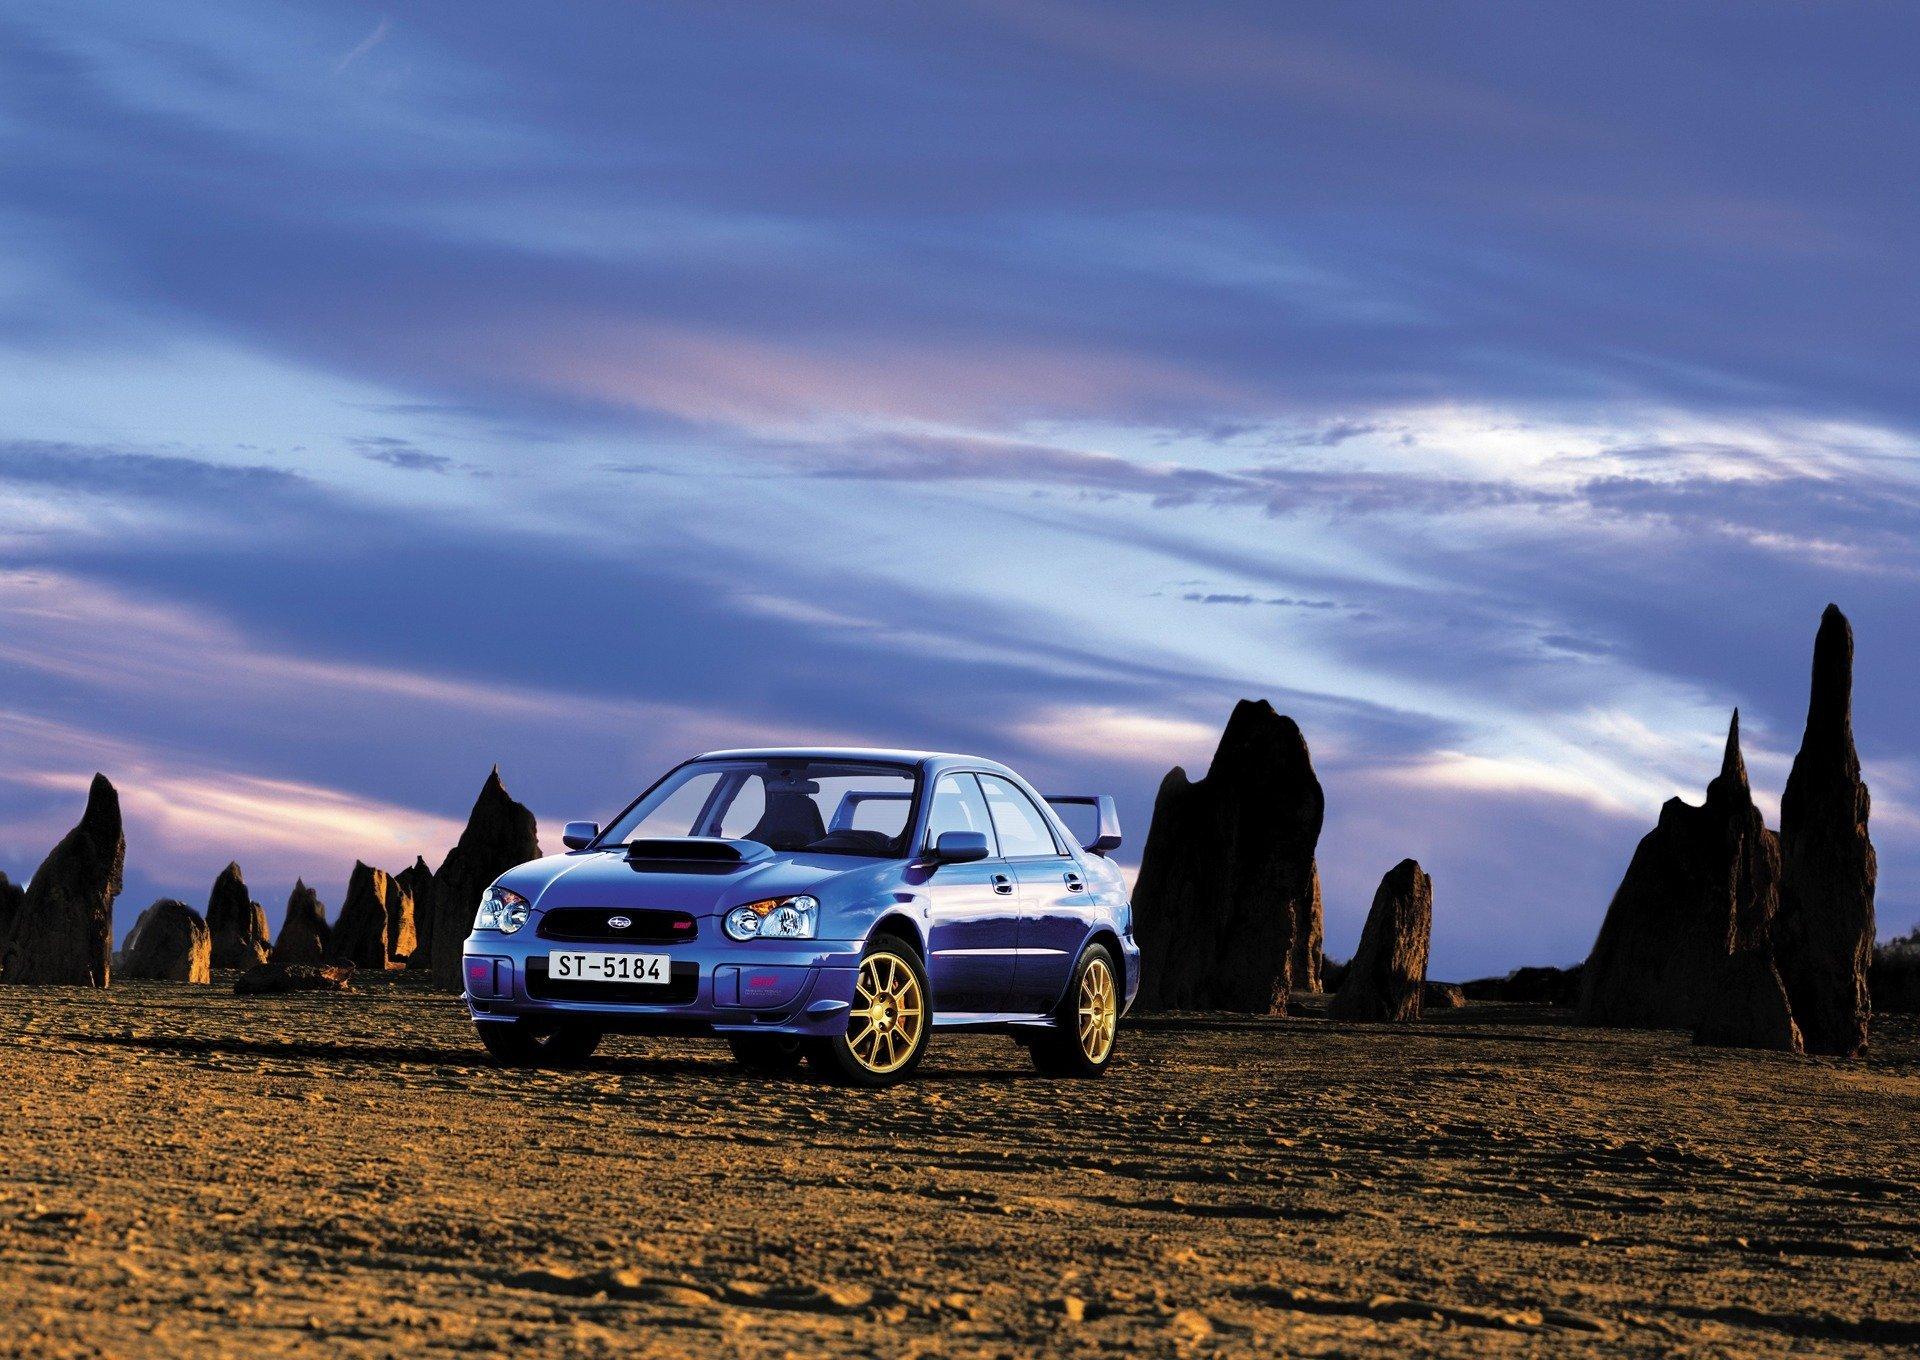 2004 Impreza WRX STI